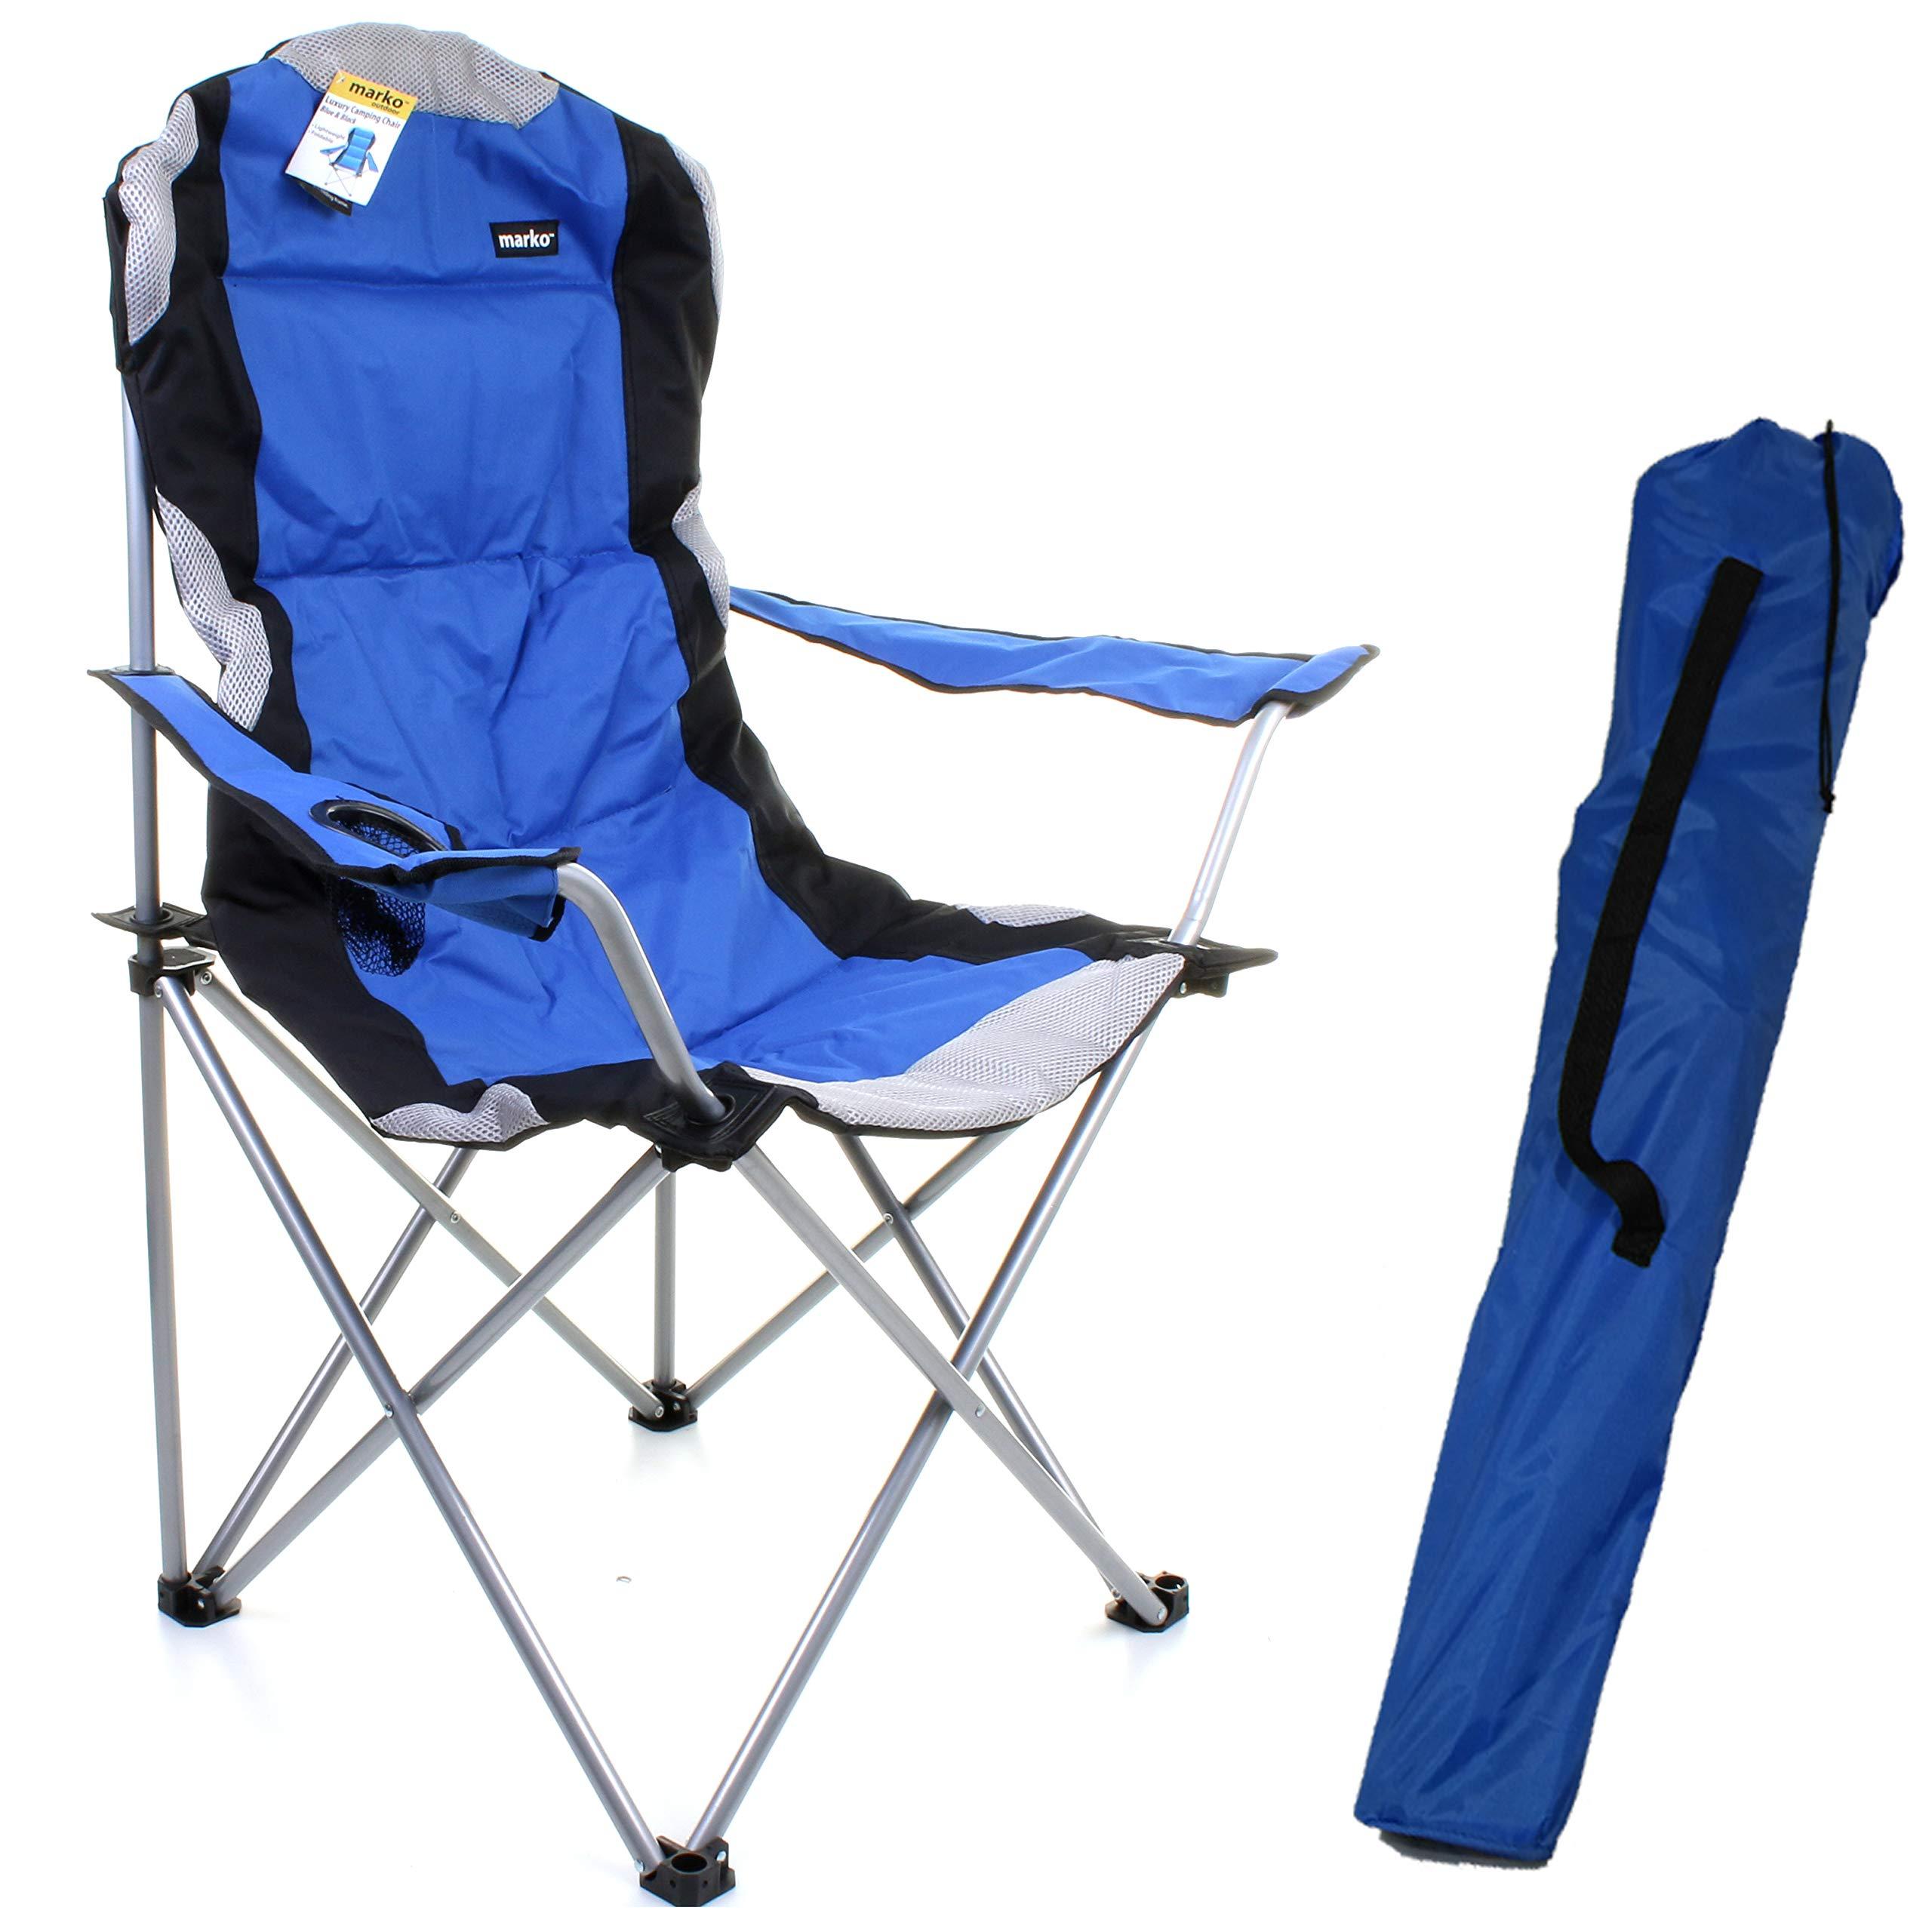 Marko Outdoor Blue Padded Folding Camping Chairs Fishing Festivals Garden SUMMER